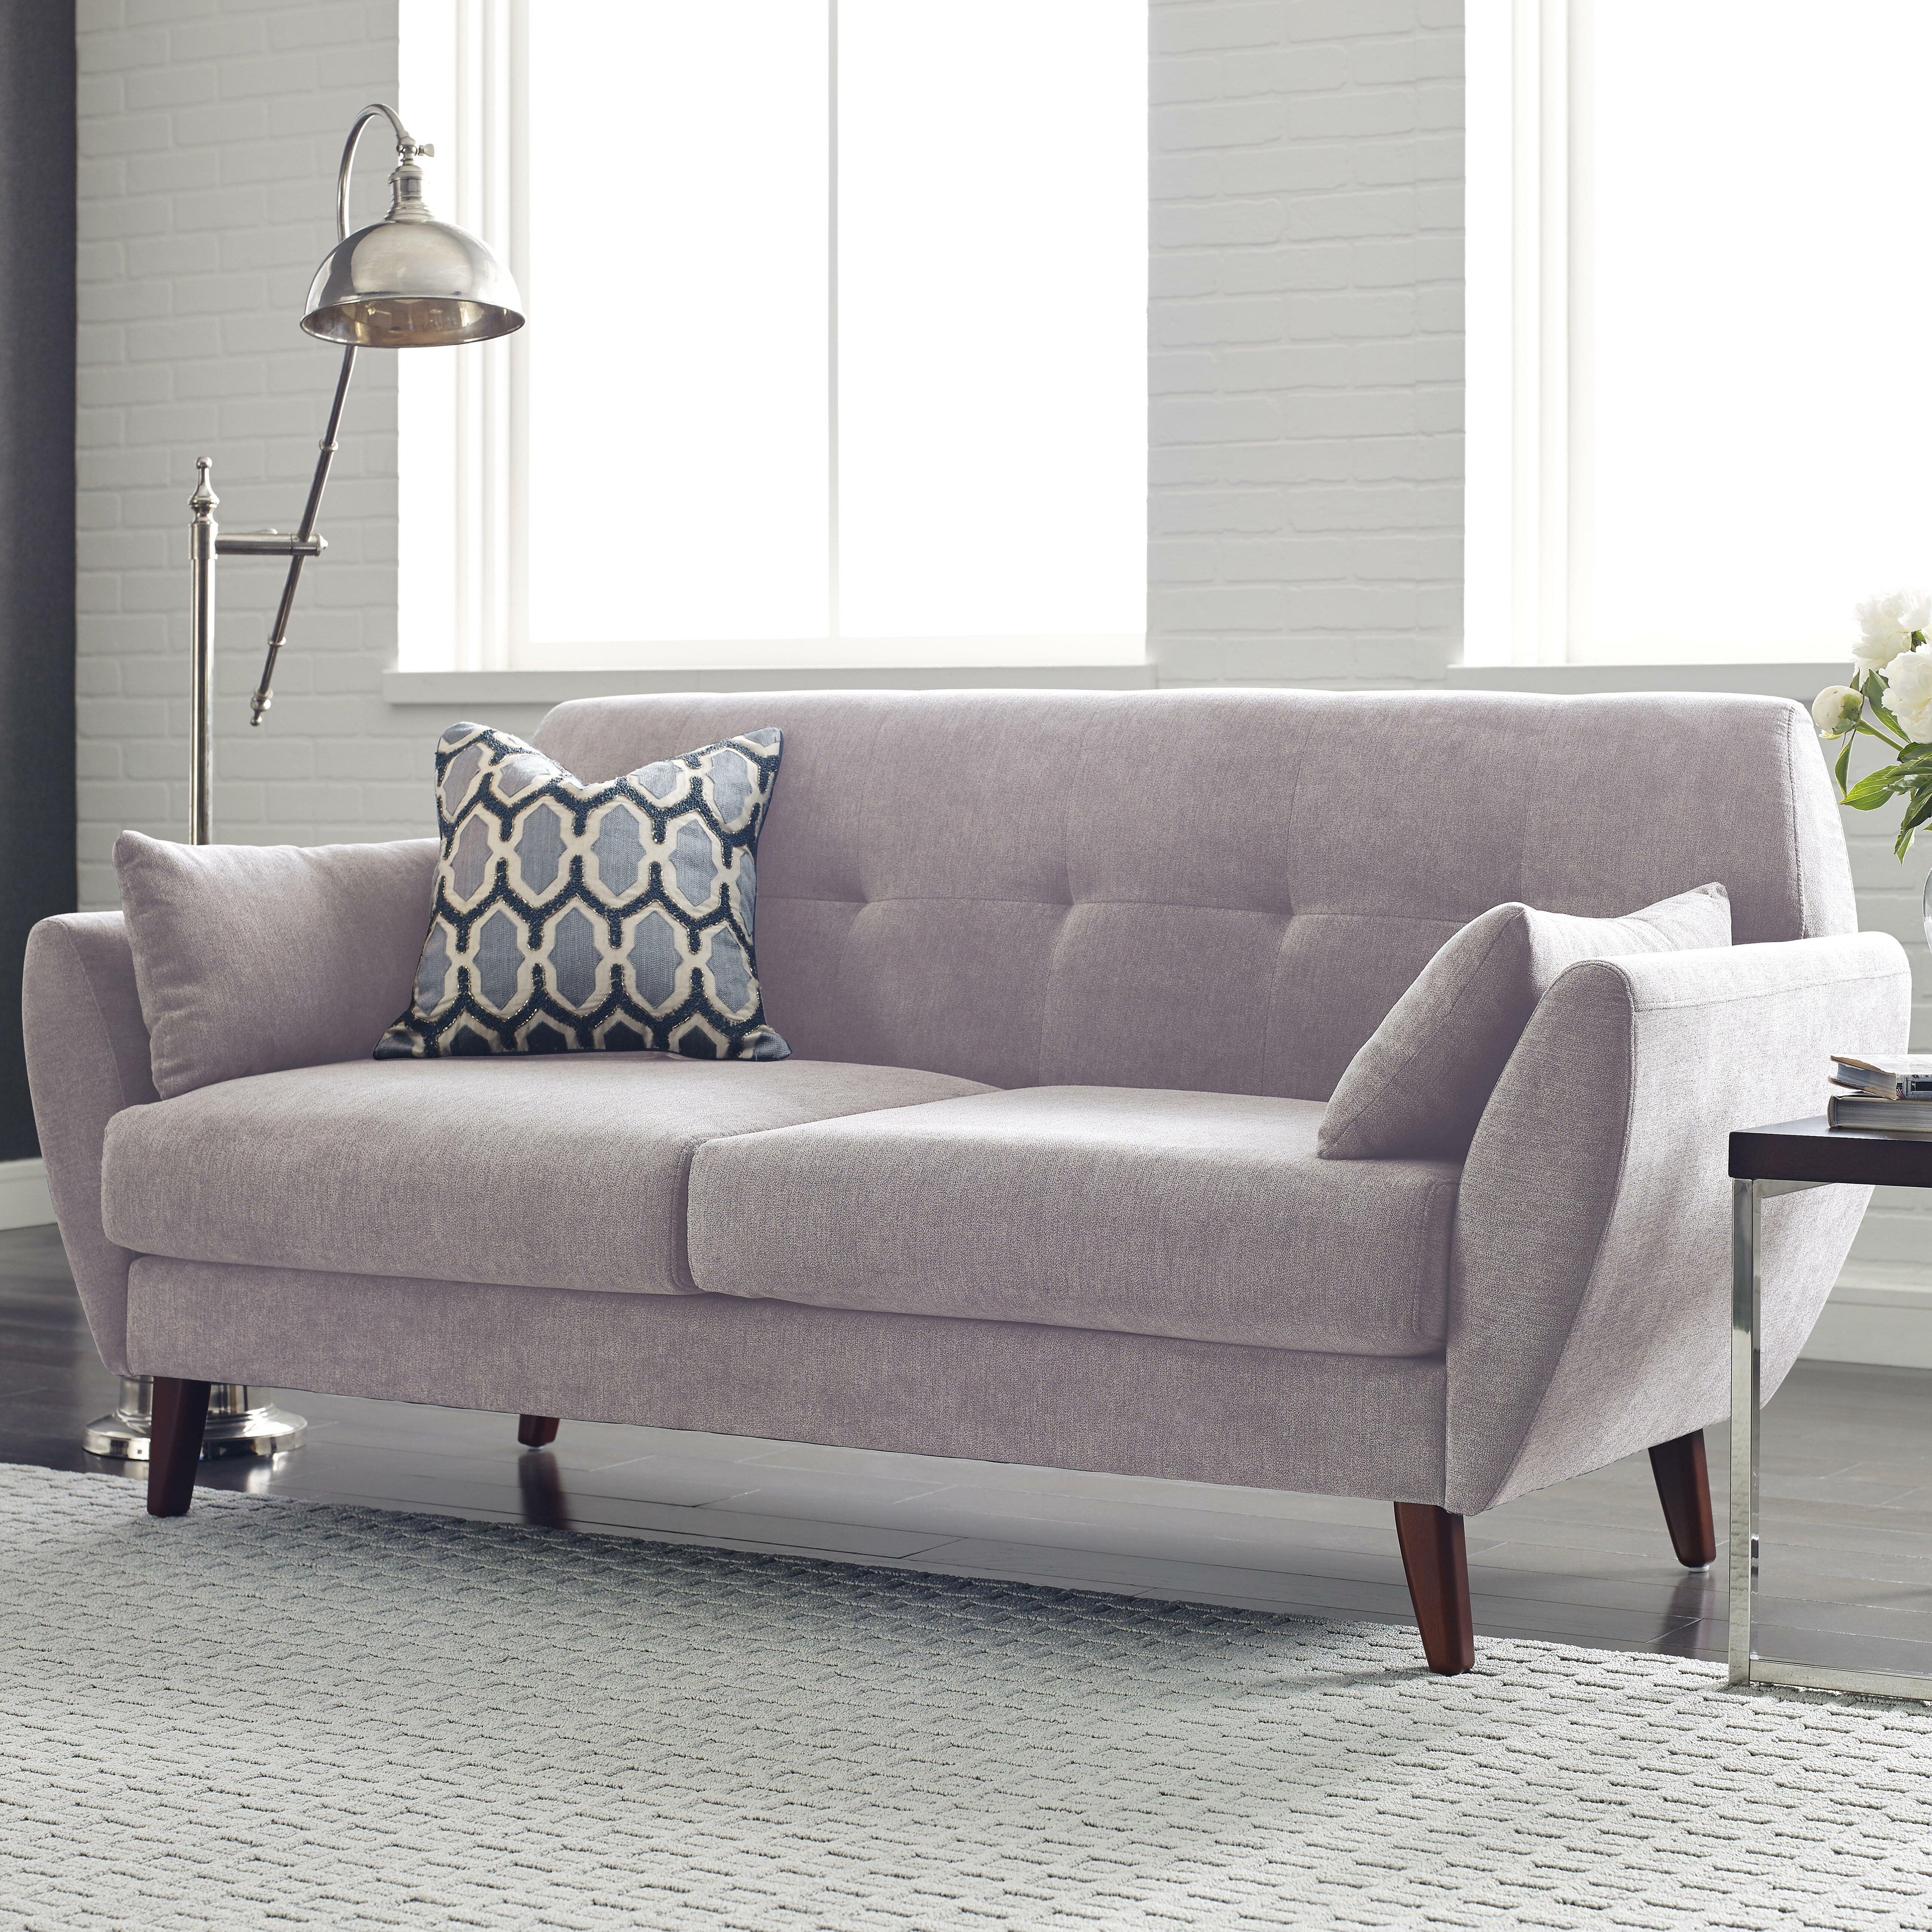 Serta Living Room Furniture Serta Living Room Furniture Reviews Nomadiceuphoriacom